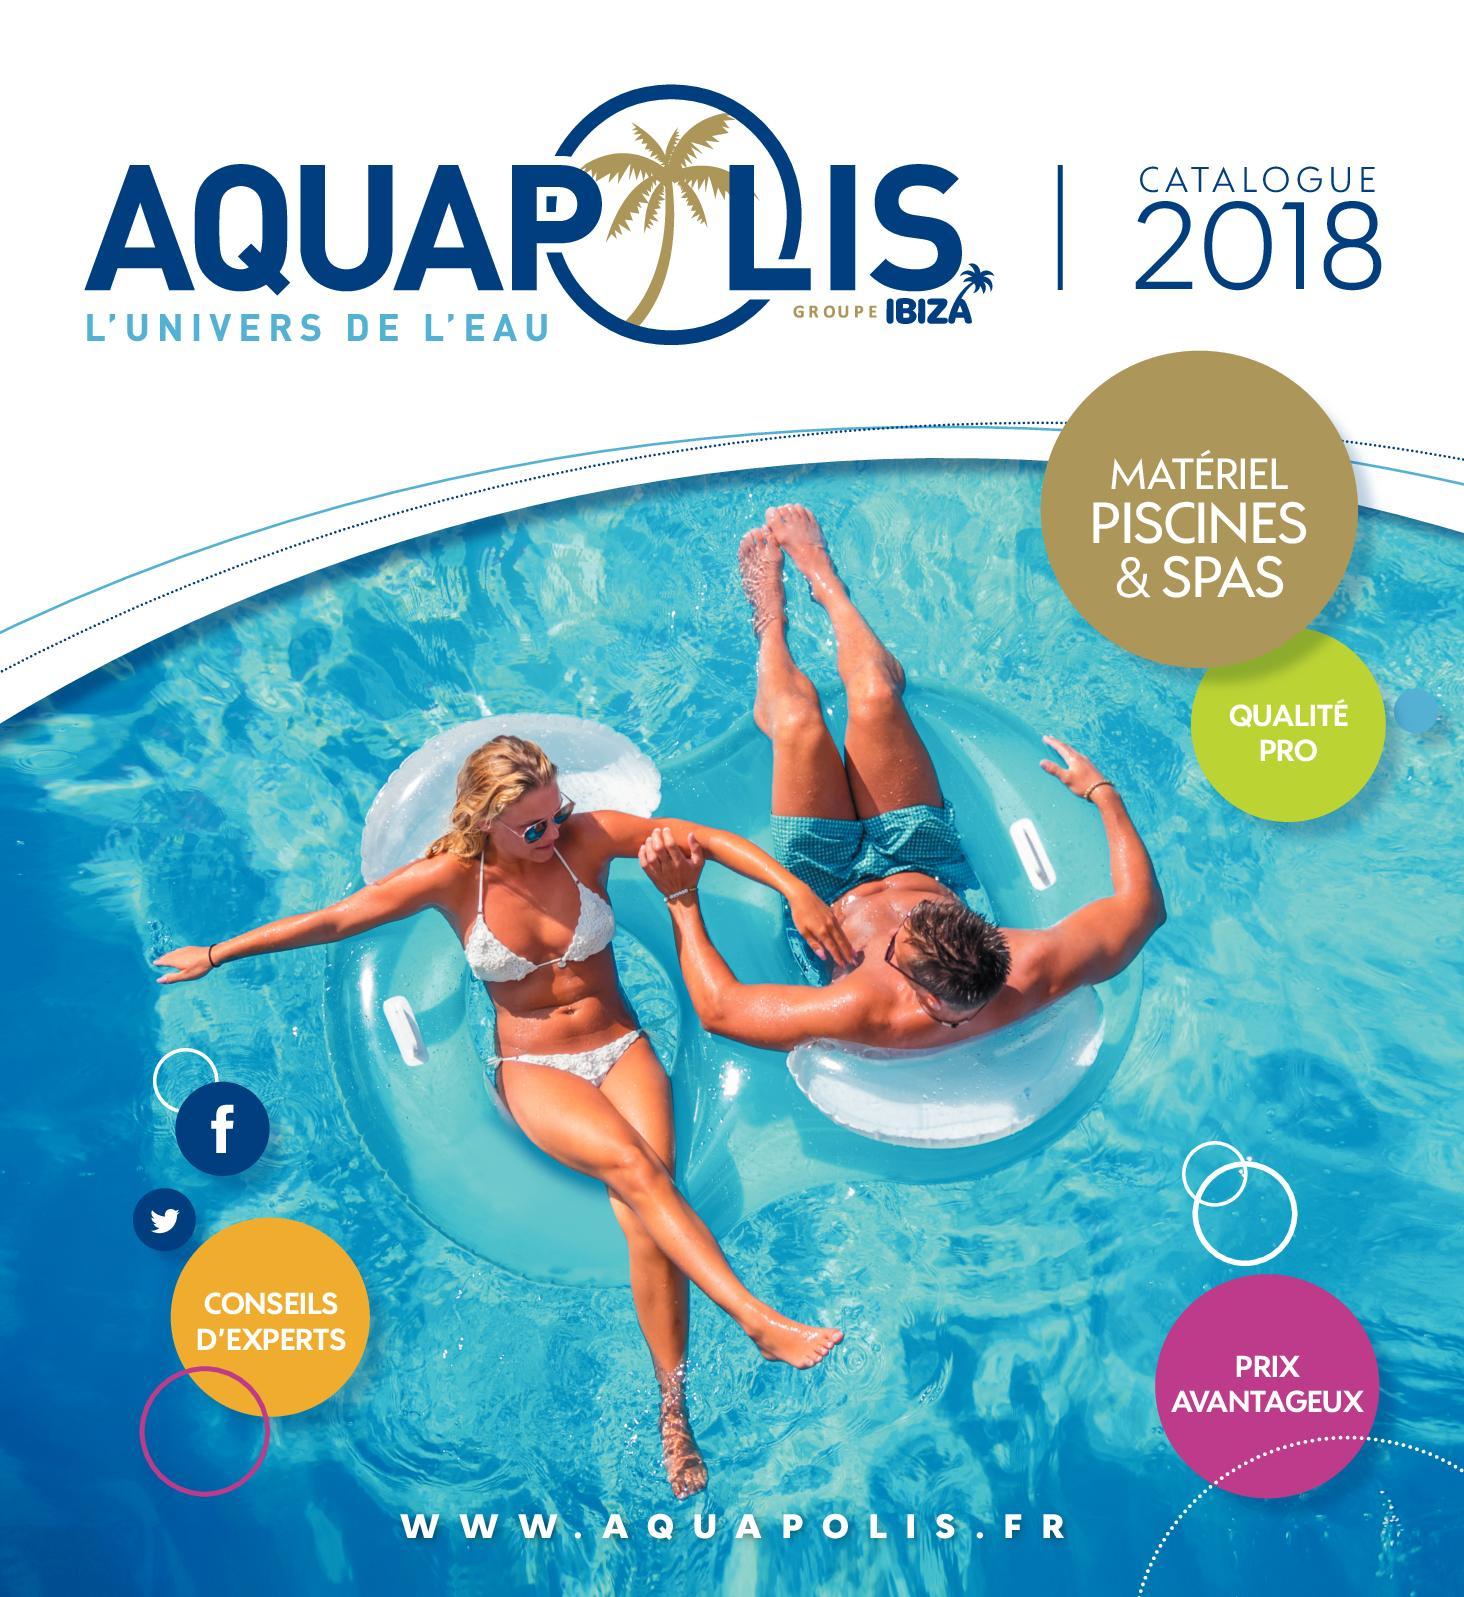 Calaméo - Aquapolis Catalogue 2018 serapportantà Enrouleur Bache Piscine Castorama